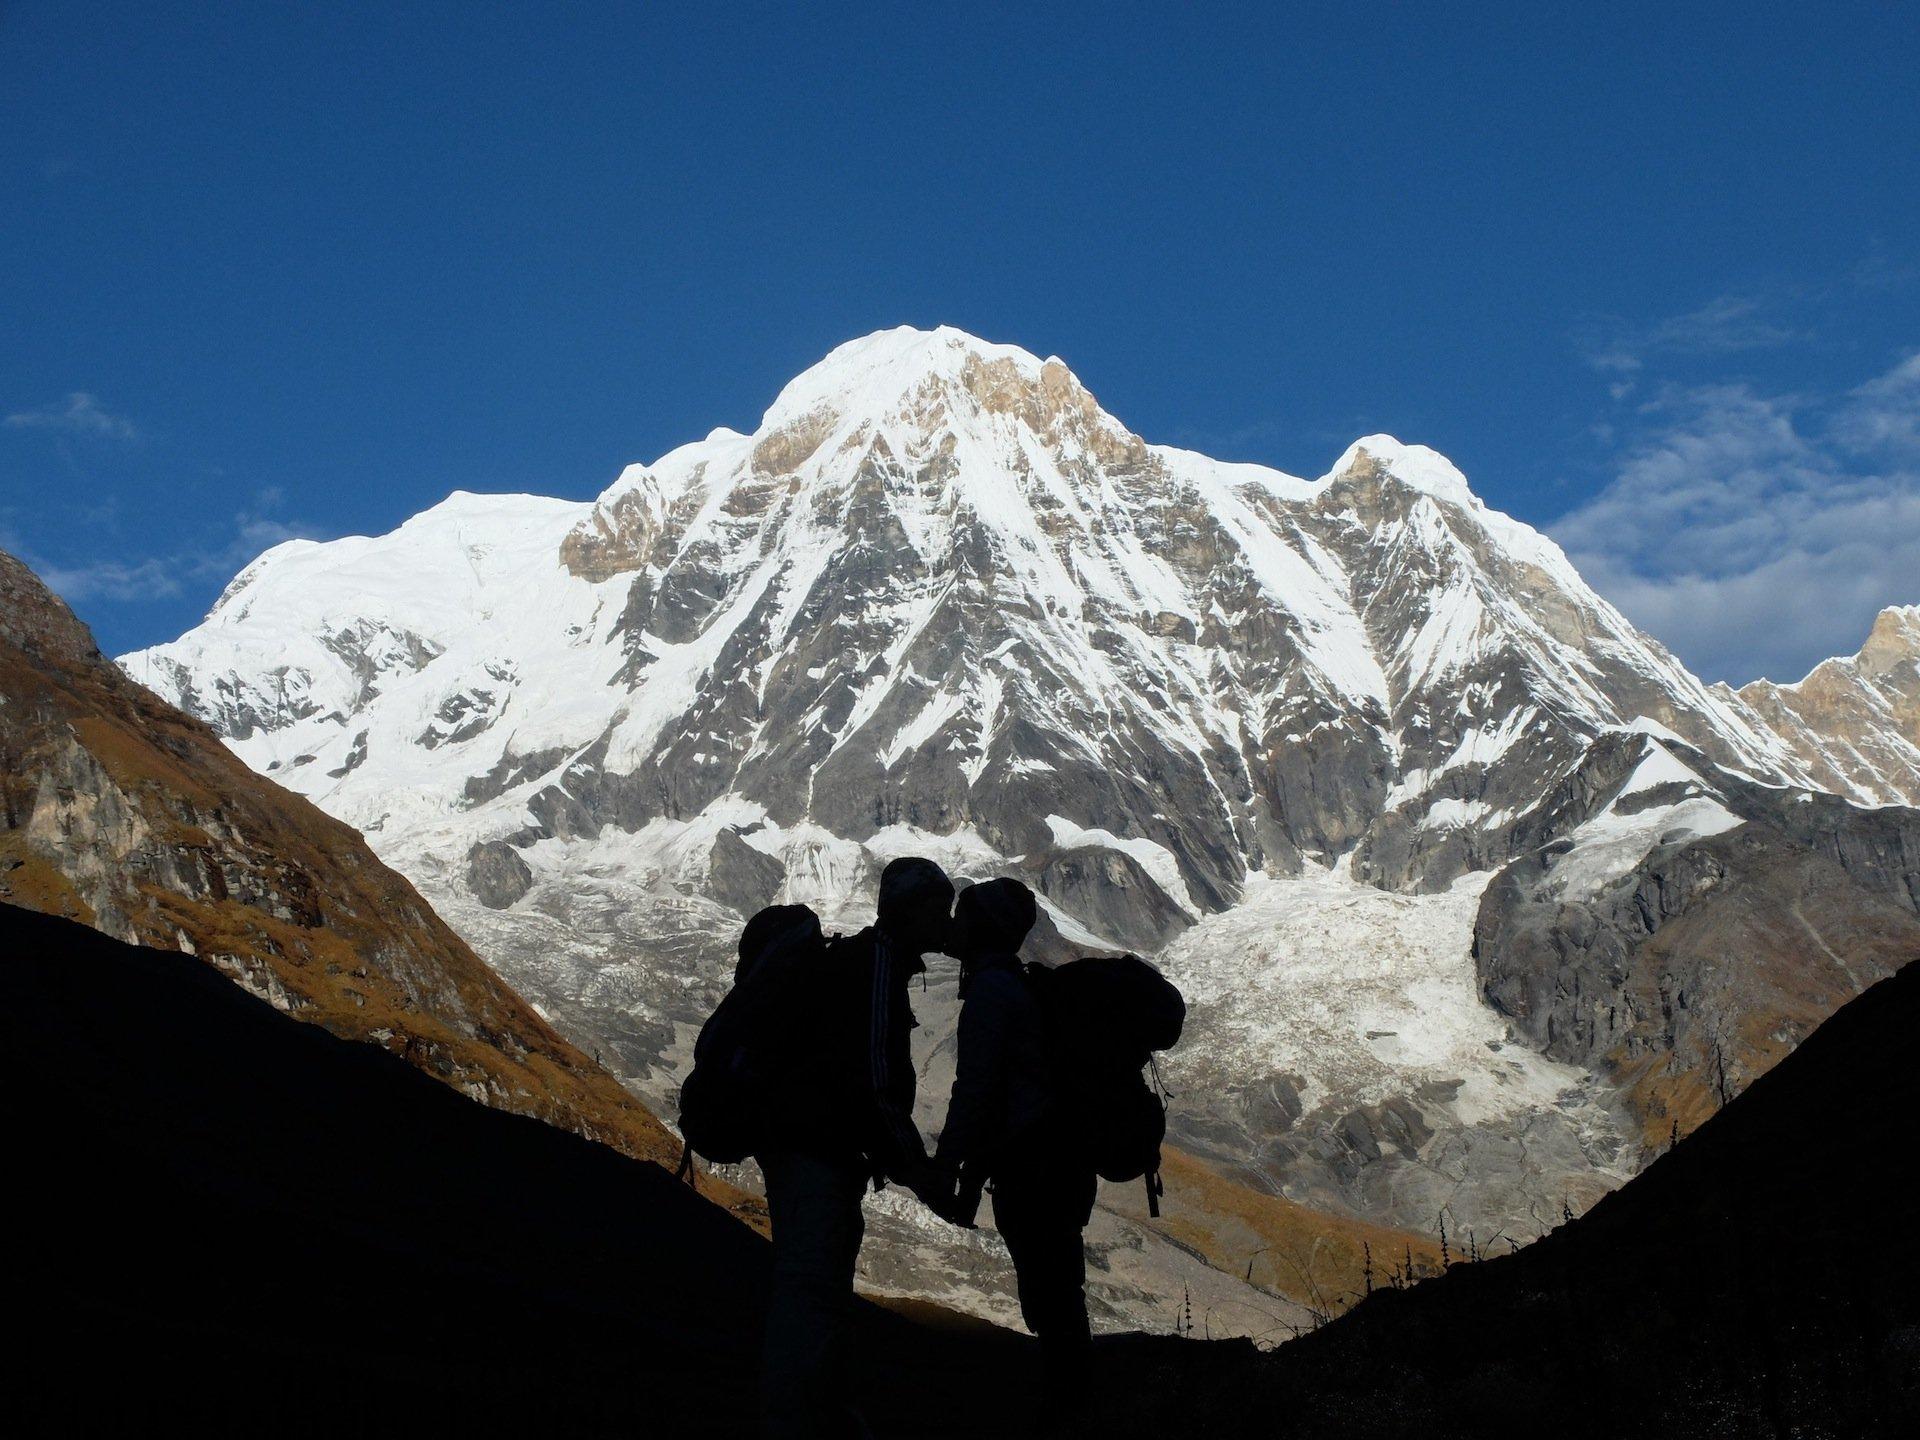 Reisebericht – Nepal / Annapurna Sanctuary: 10 Tage Rundtour zum Annapurna Basecamp (A.B.C.) im Himalaya